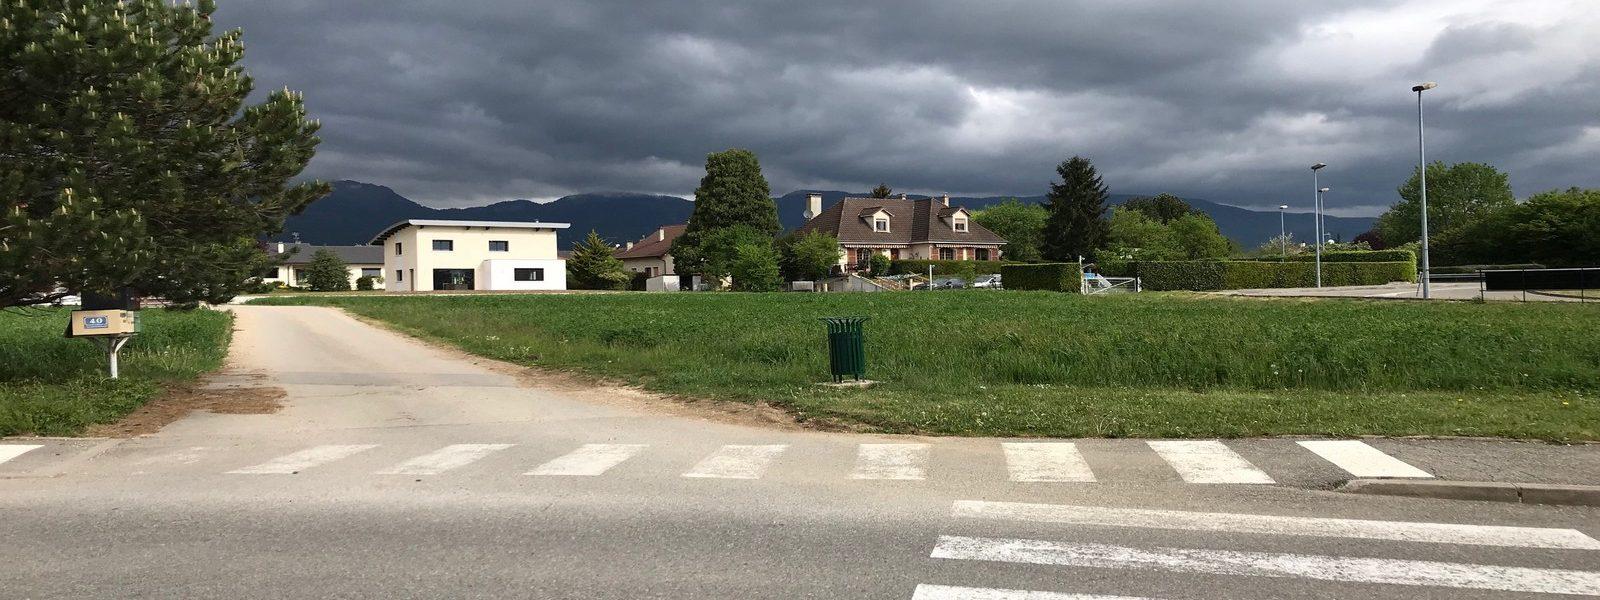 LE COIN LISA - Visuel 2 - Impact immobilier 01